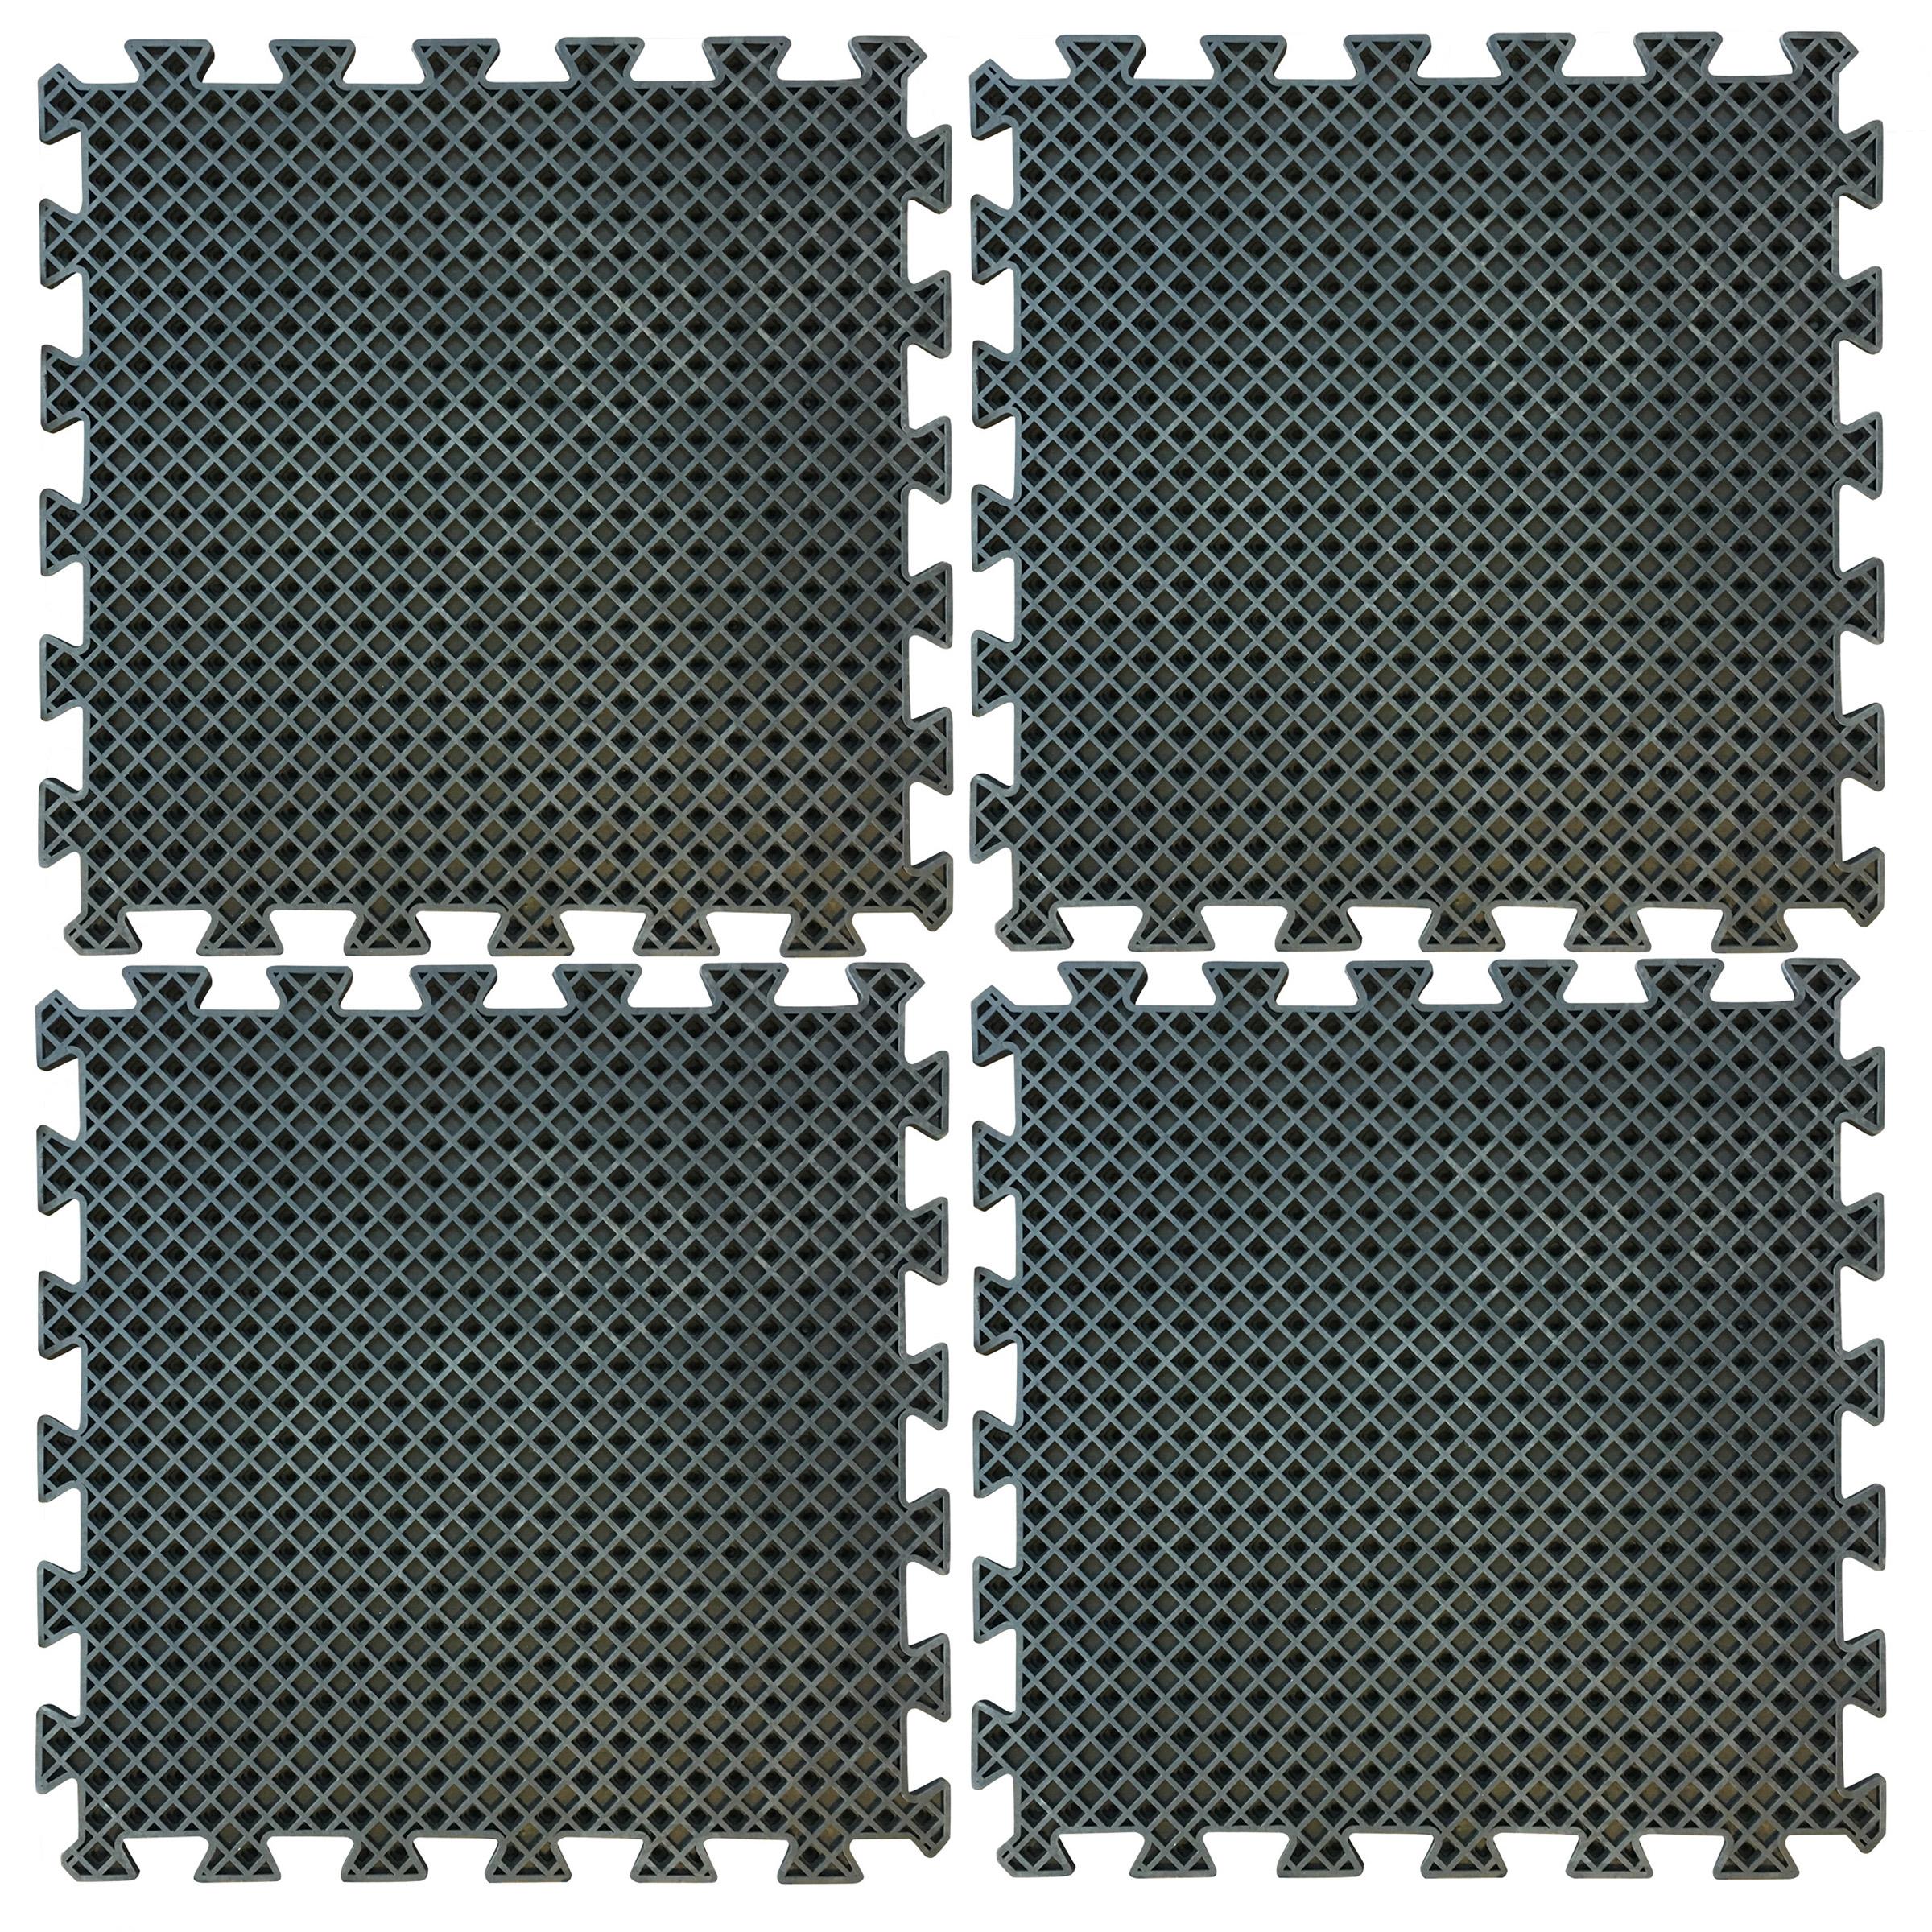 4 Piece Interlocking Rubber Mat Set